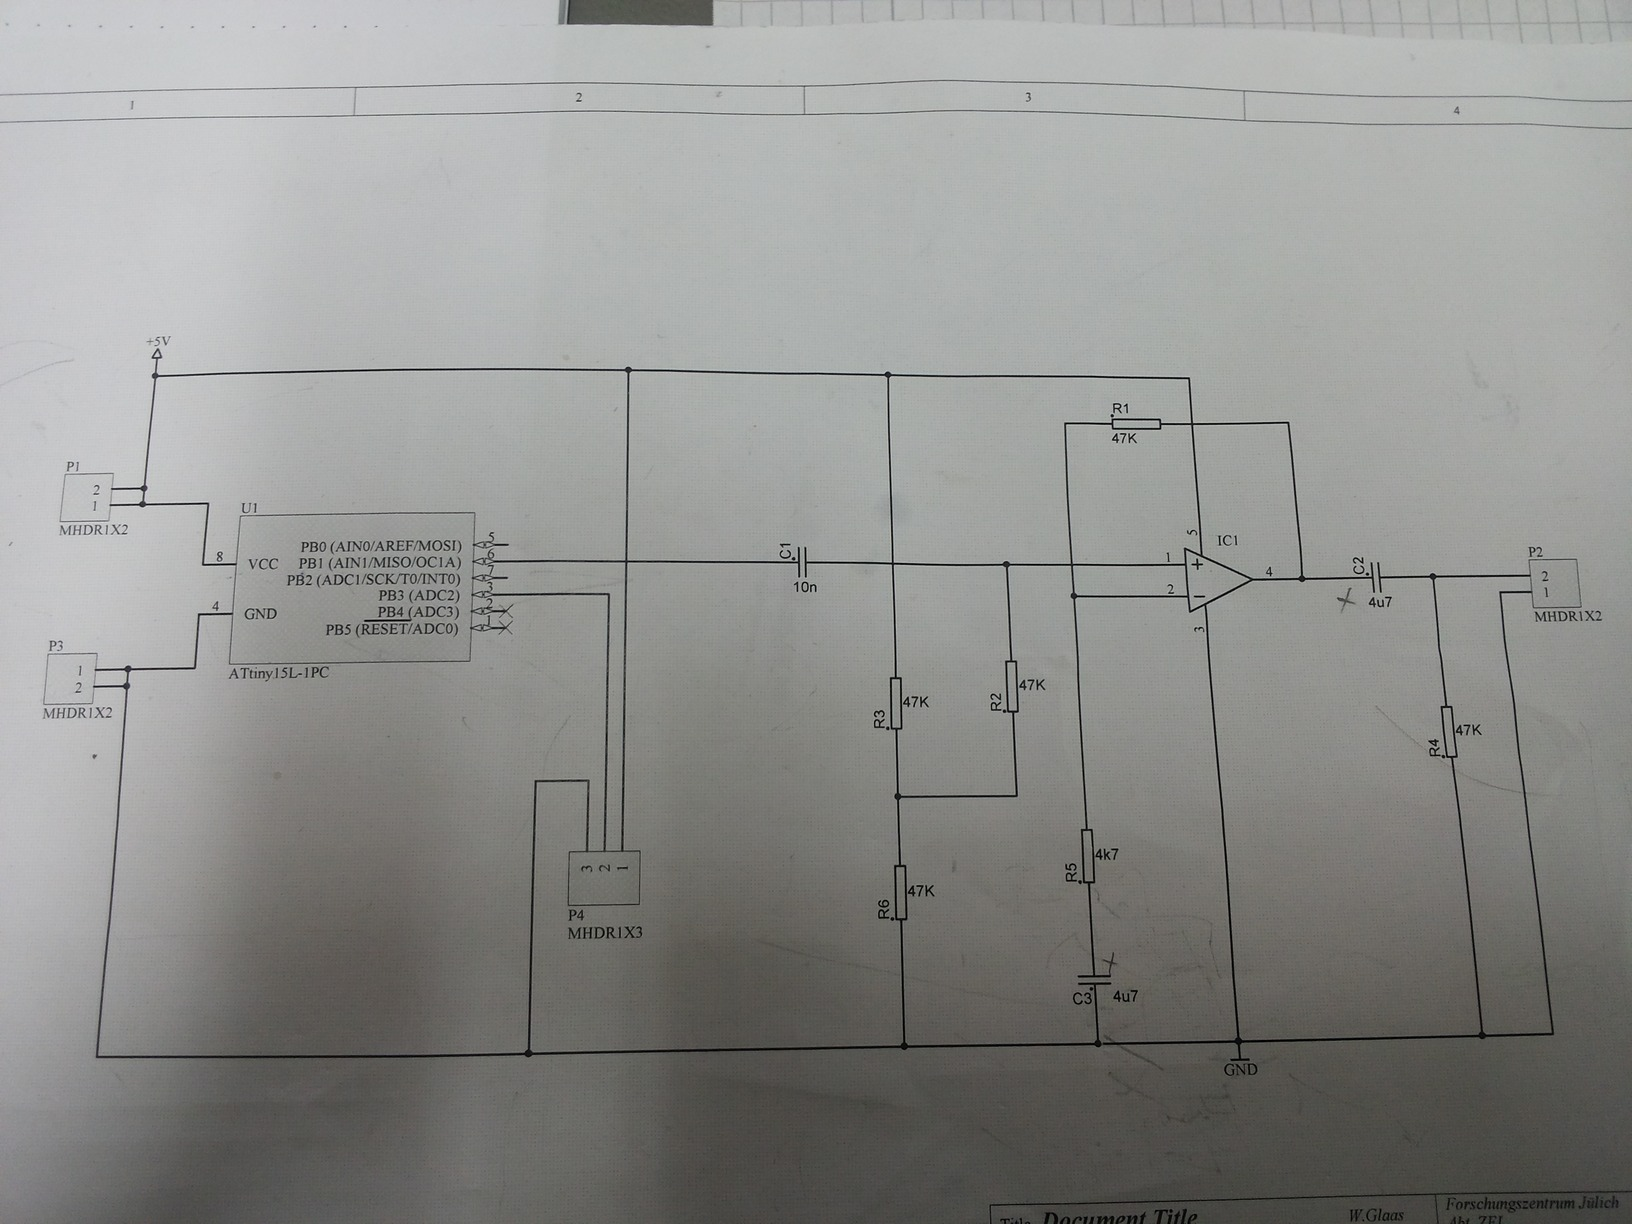 Erfreut Bugfahrwerk Schaltplan Bilder - Verdrahtungsideen - korsmi.info